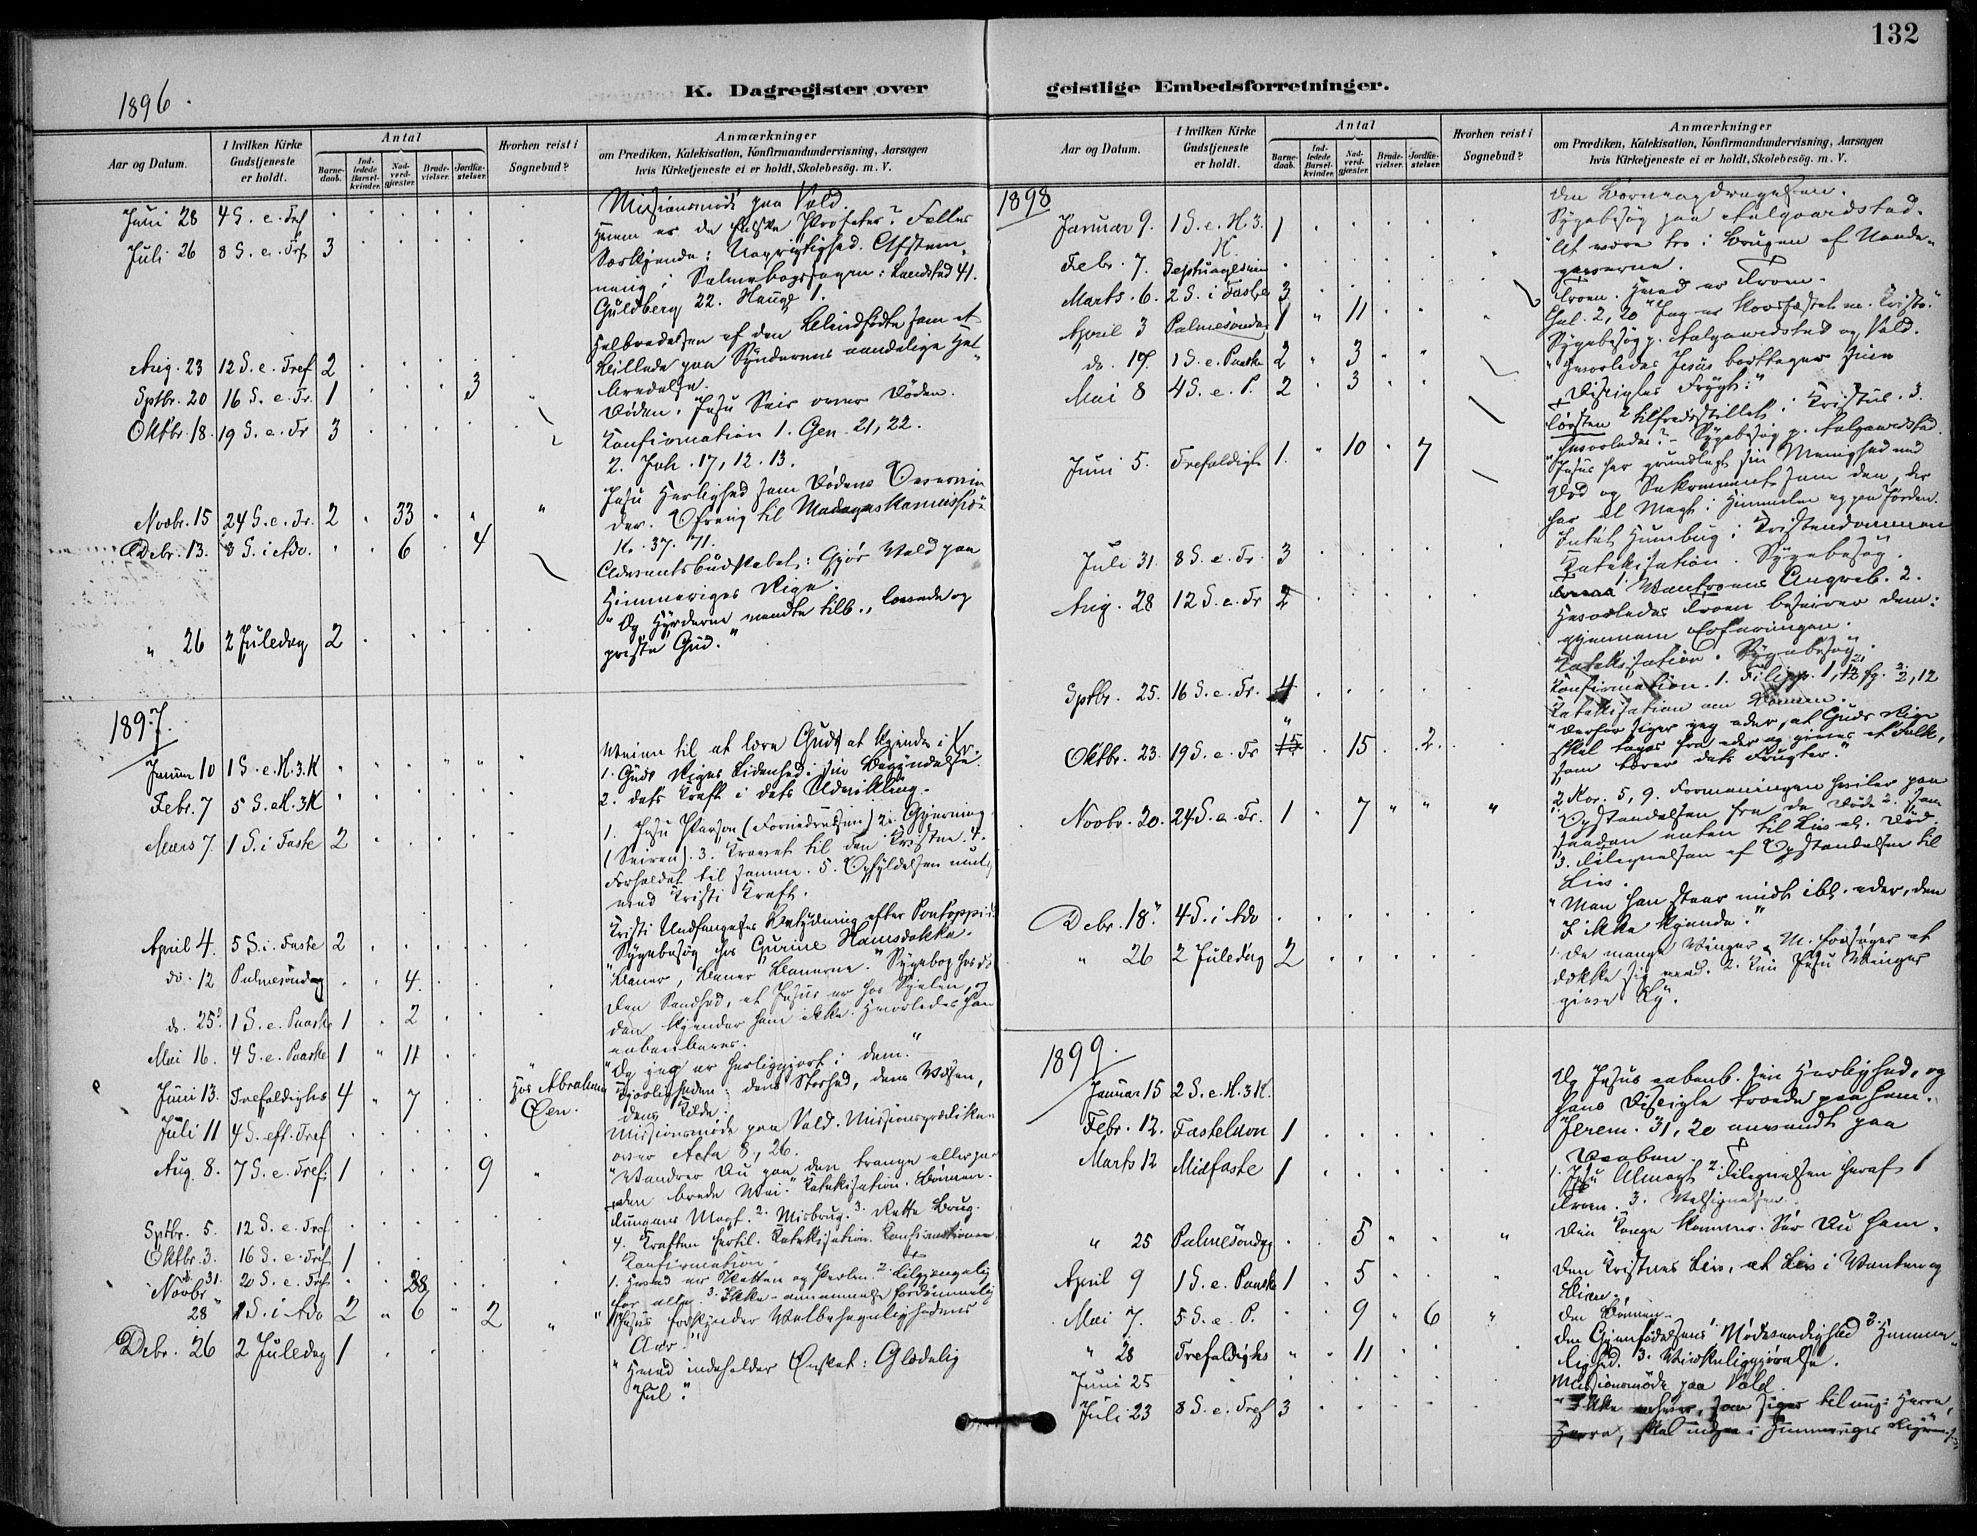 SAKO, Solum kirkebøker, F/Fc/L0002: Ministerialbok nr. III 2, 1892-1906, s. 132